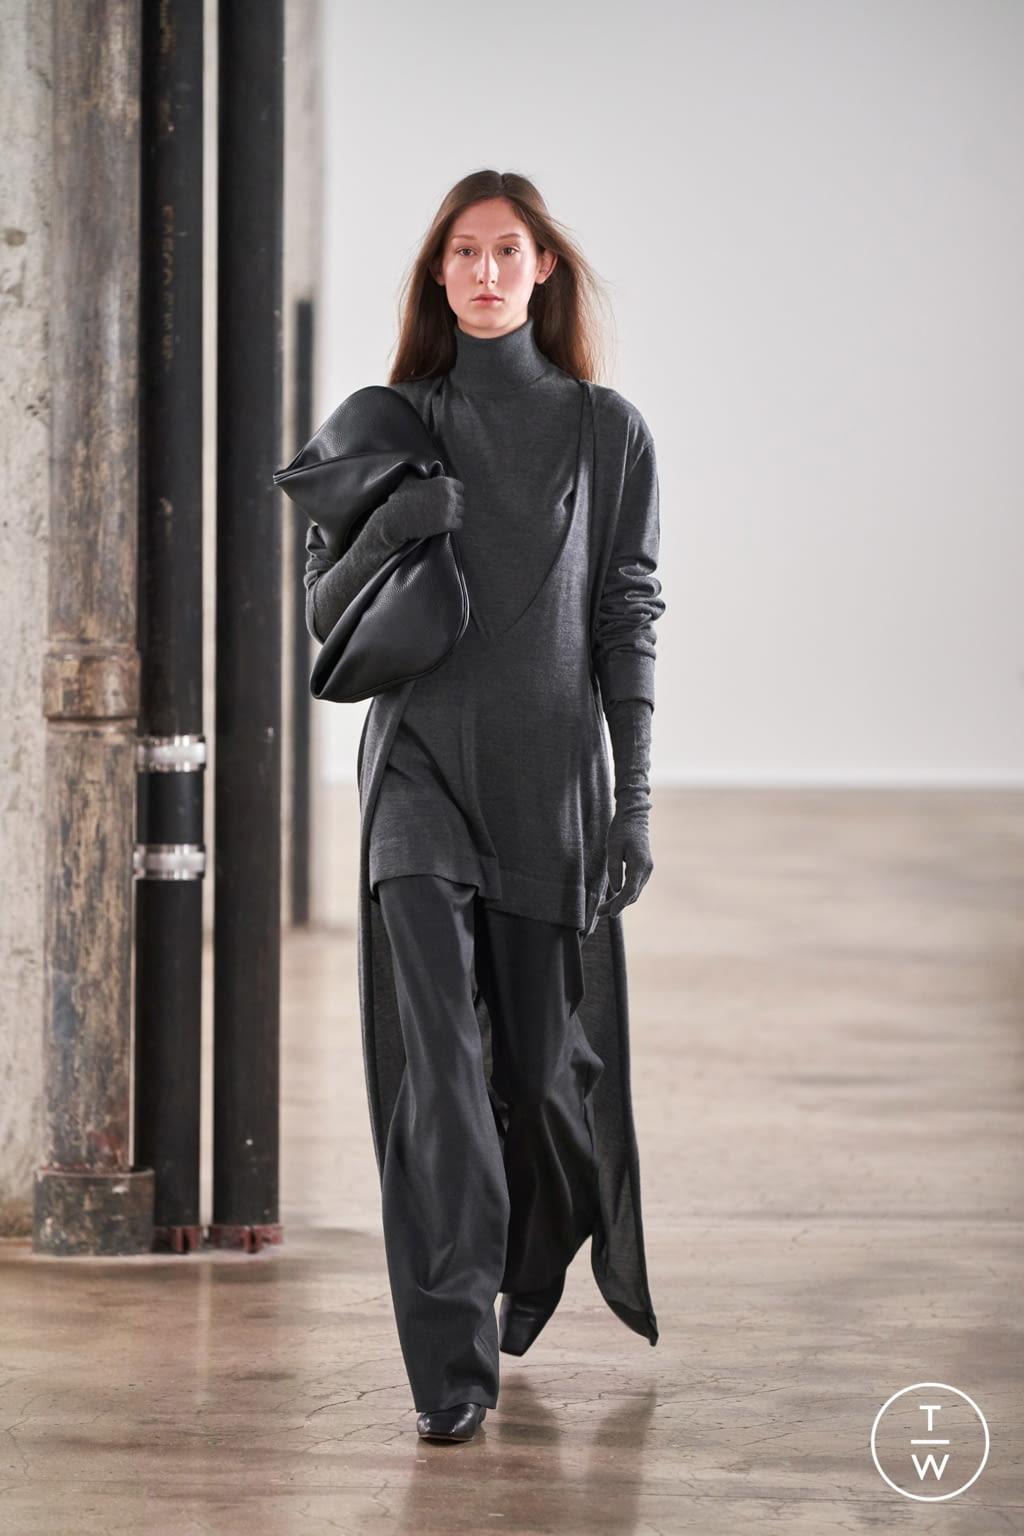 Fashion Week New York Fall/Winter 2020 look 13 de la collection The Row womenswear